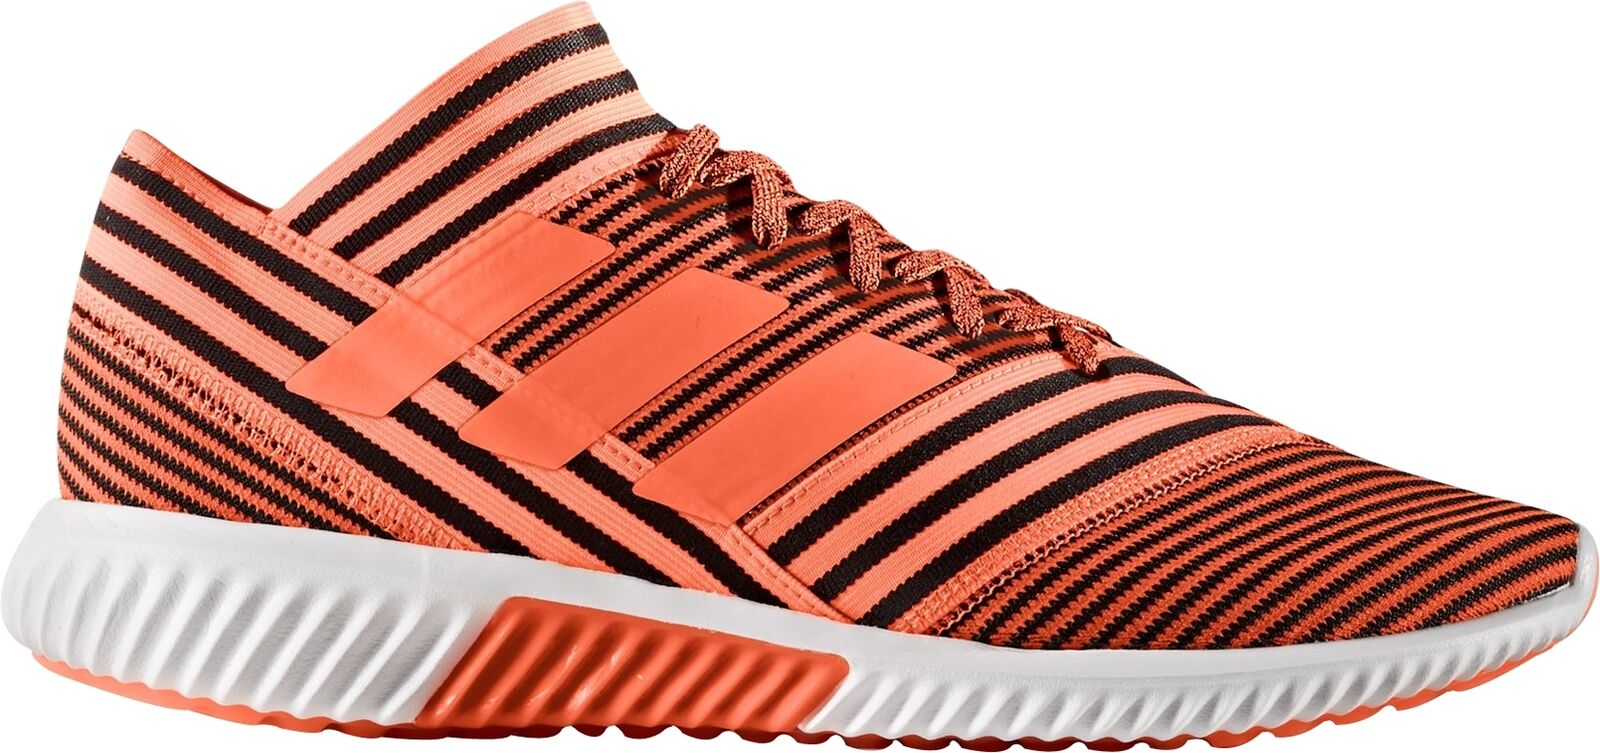 Adidas Nemeziz Tango 17.1 Mens Trainers - Orange  | Online Shop